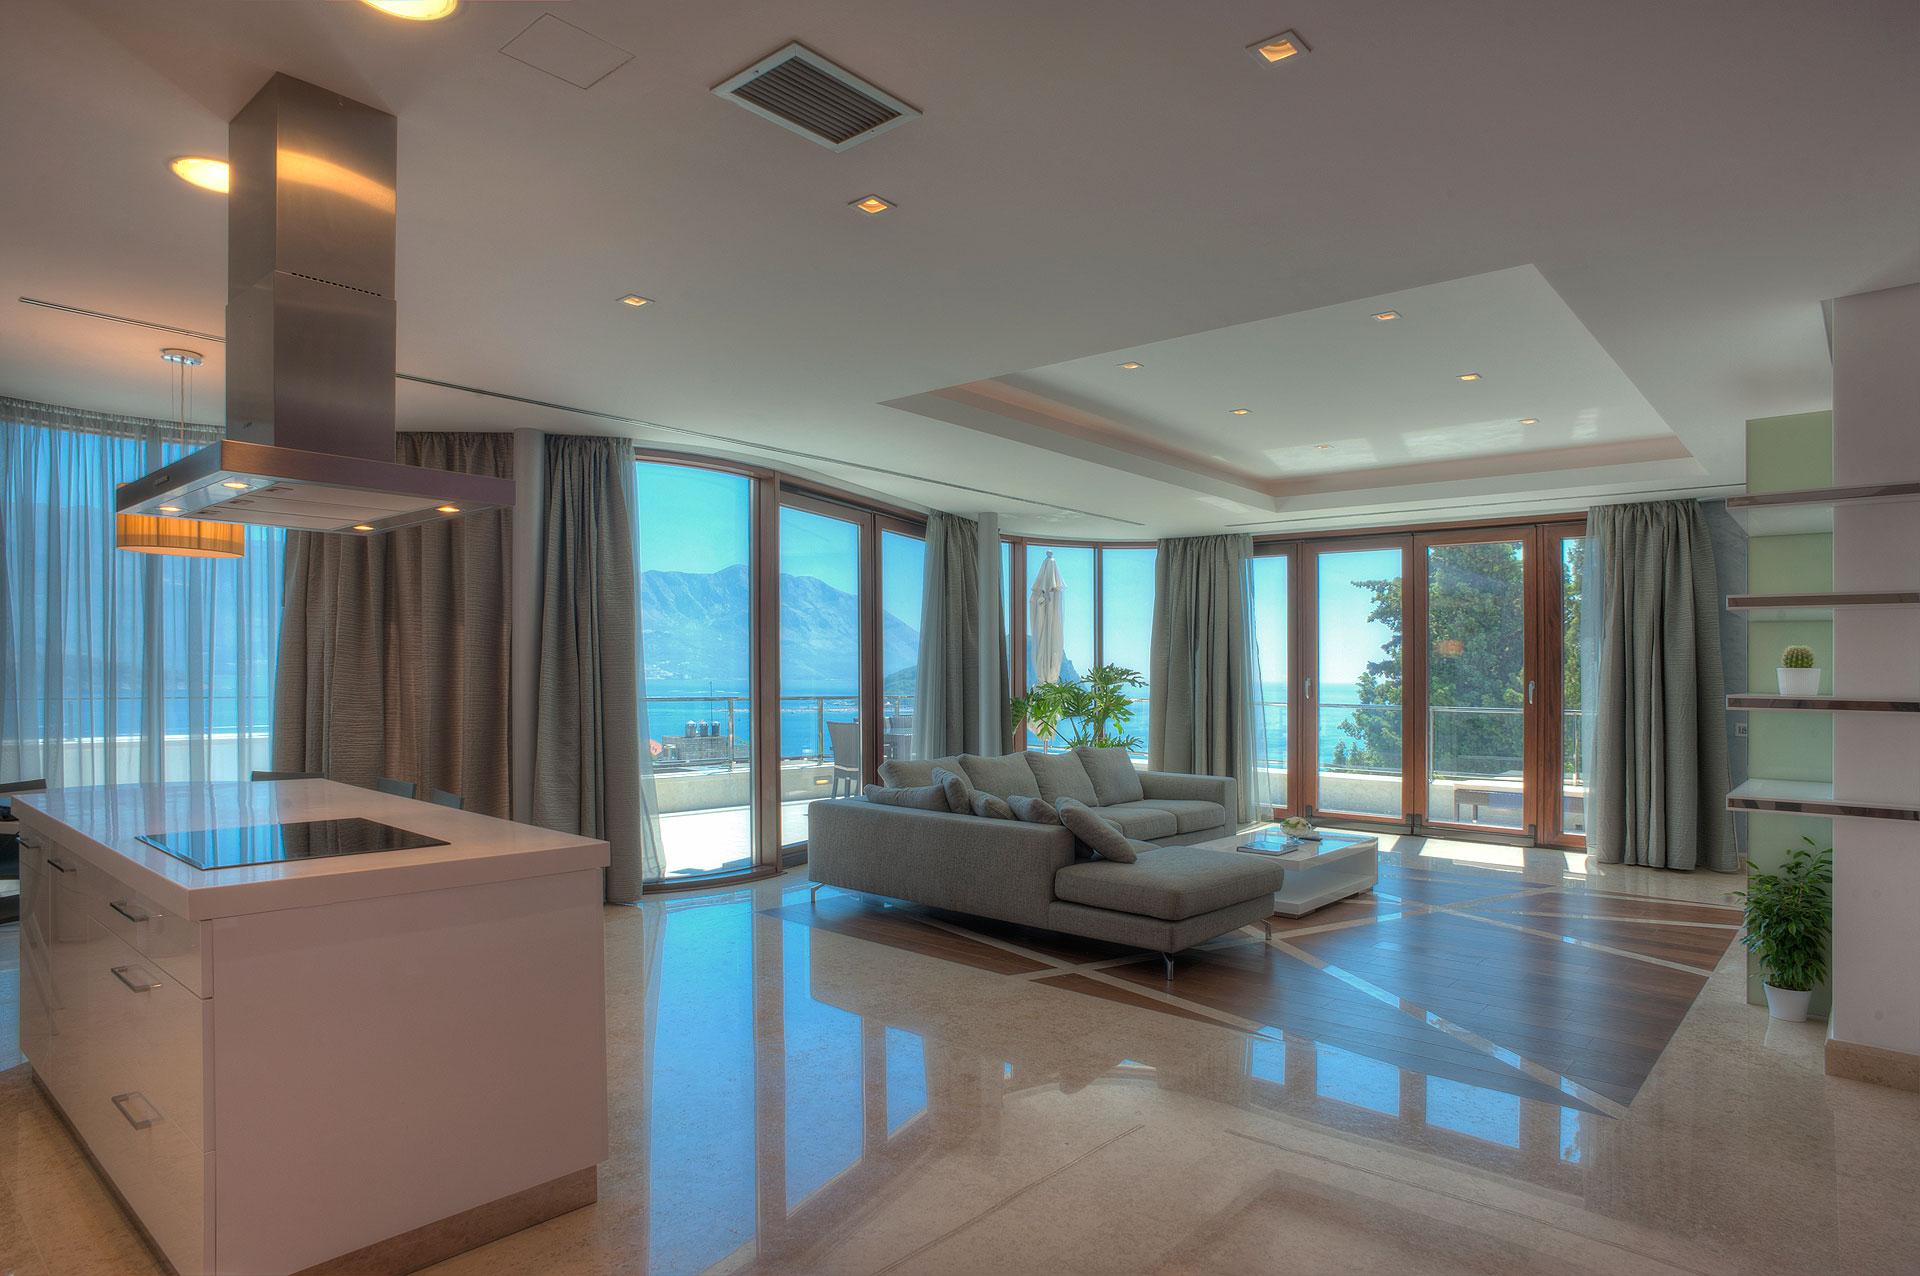 401 living room 5